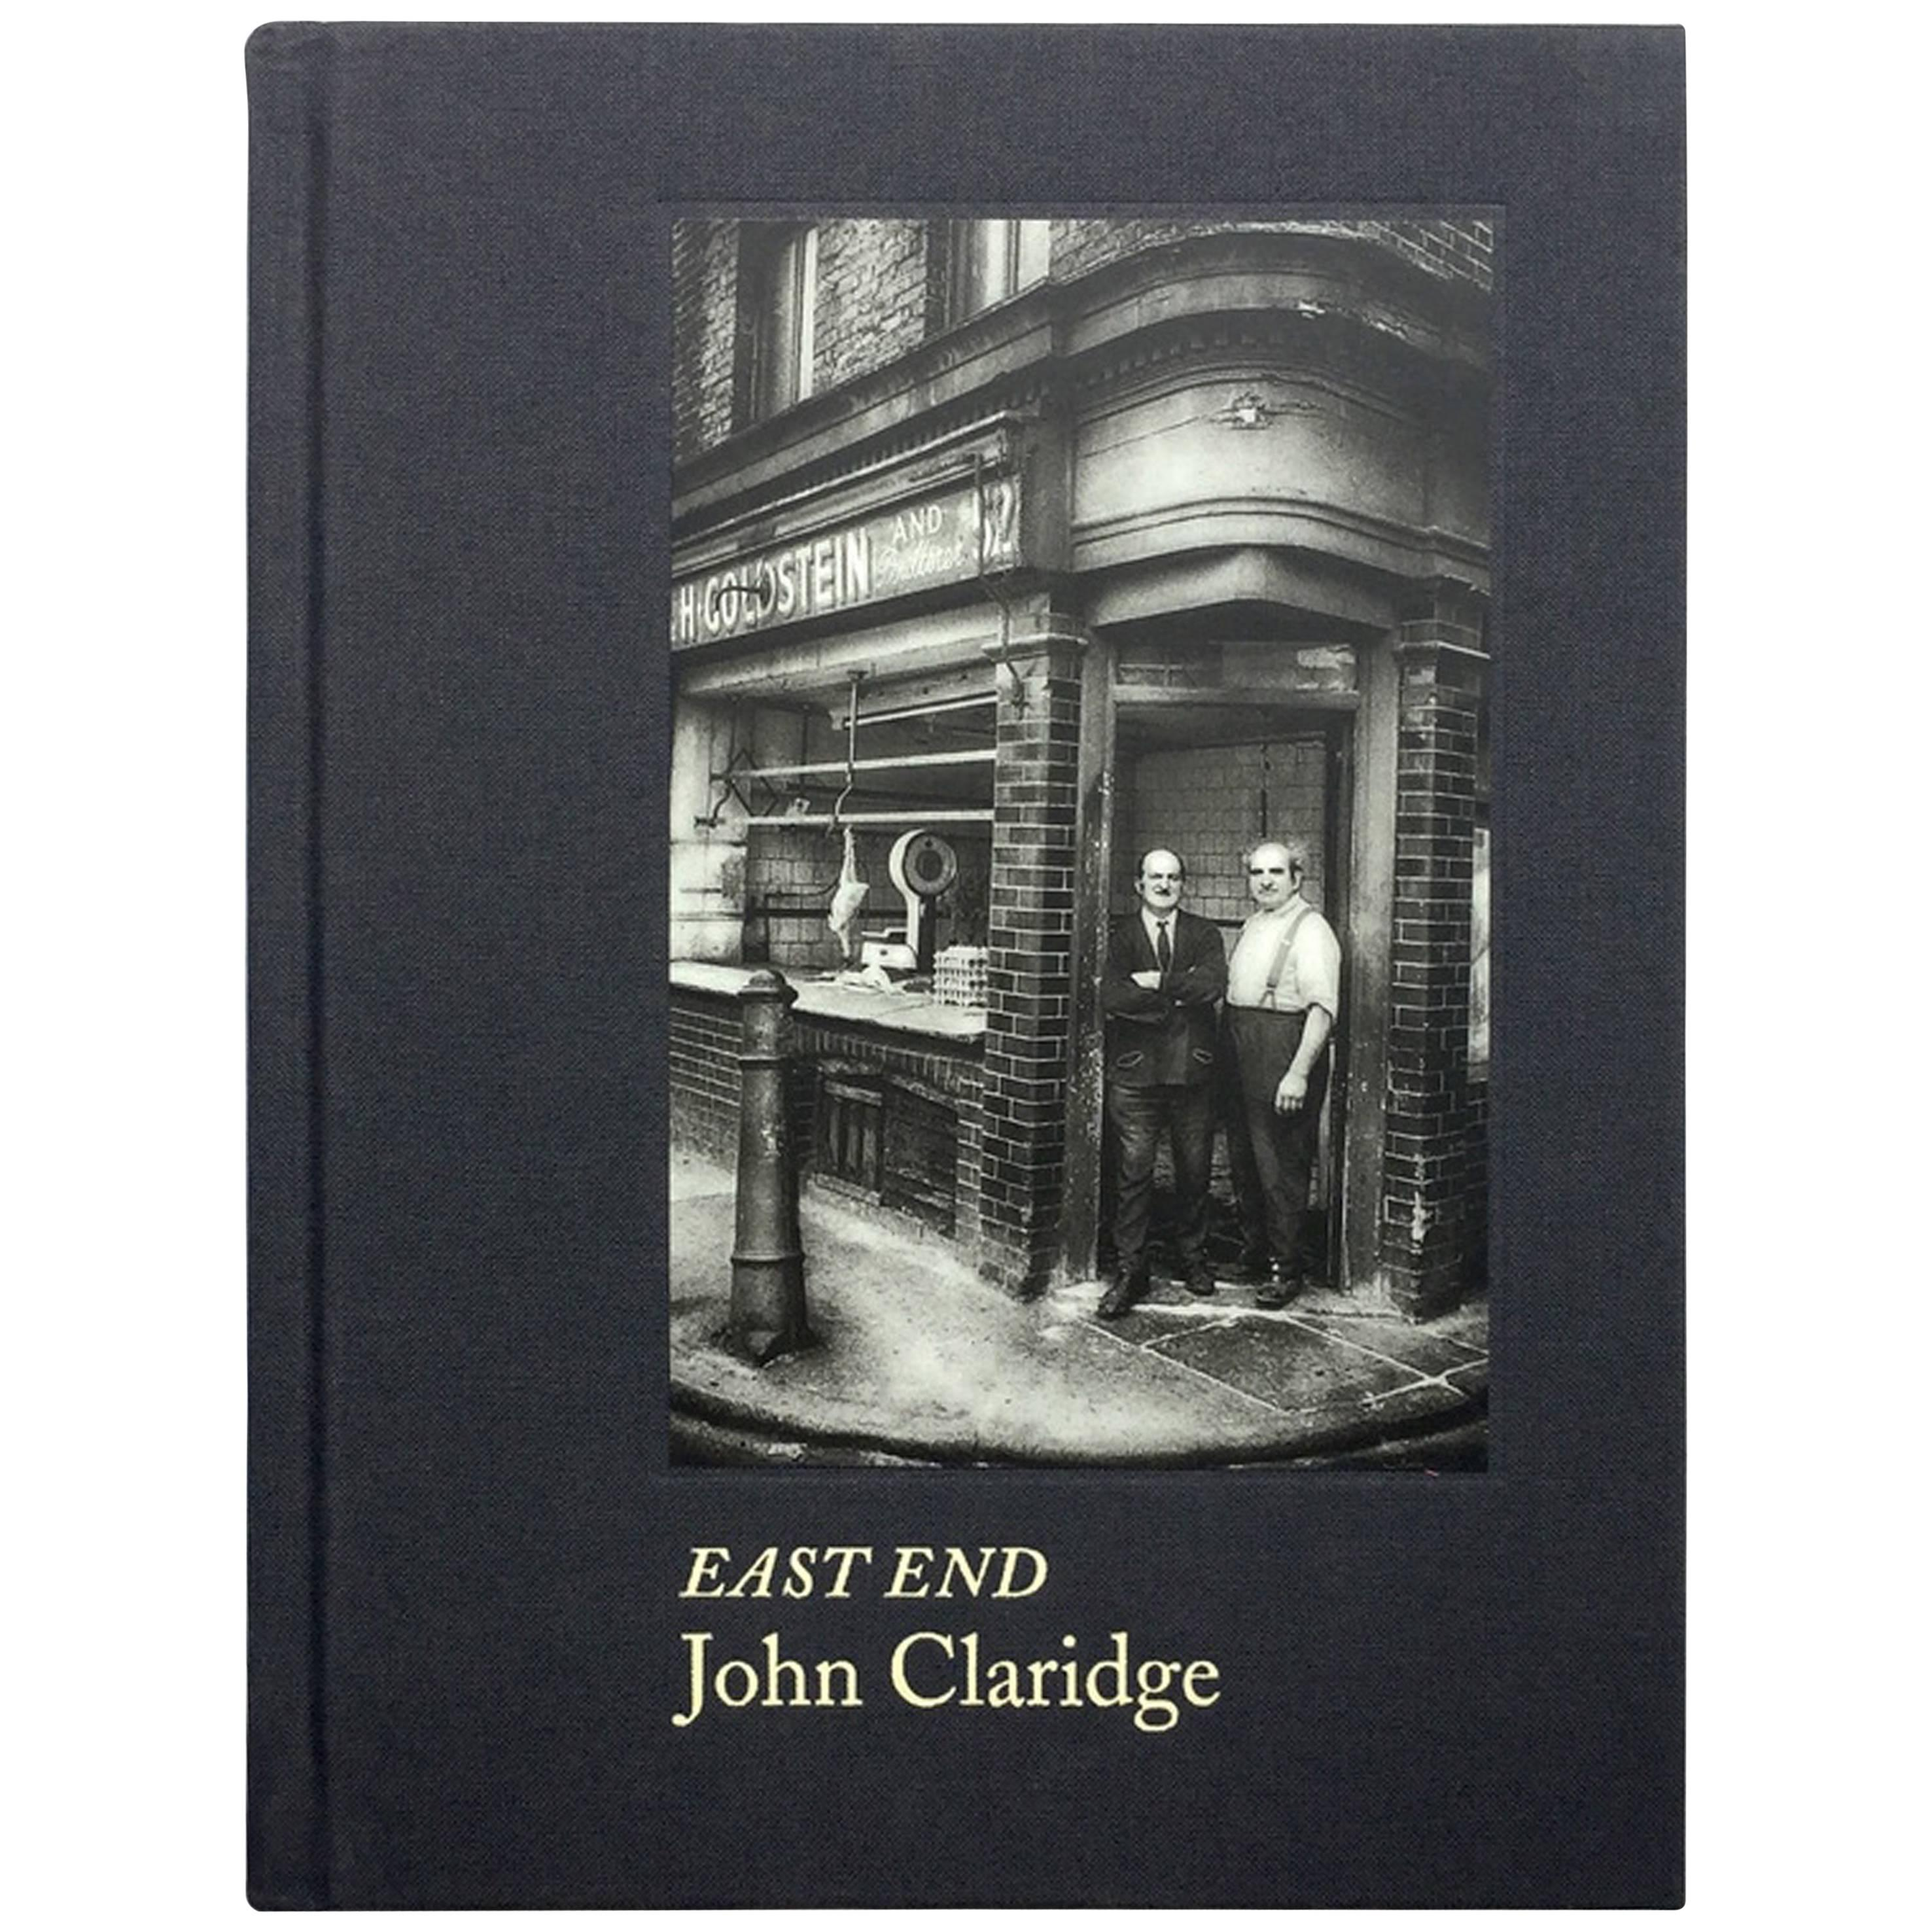 John Claridge - East End, Signed 1st Edition